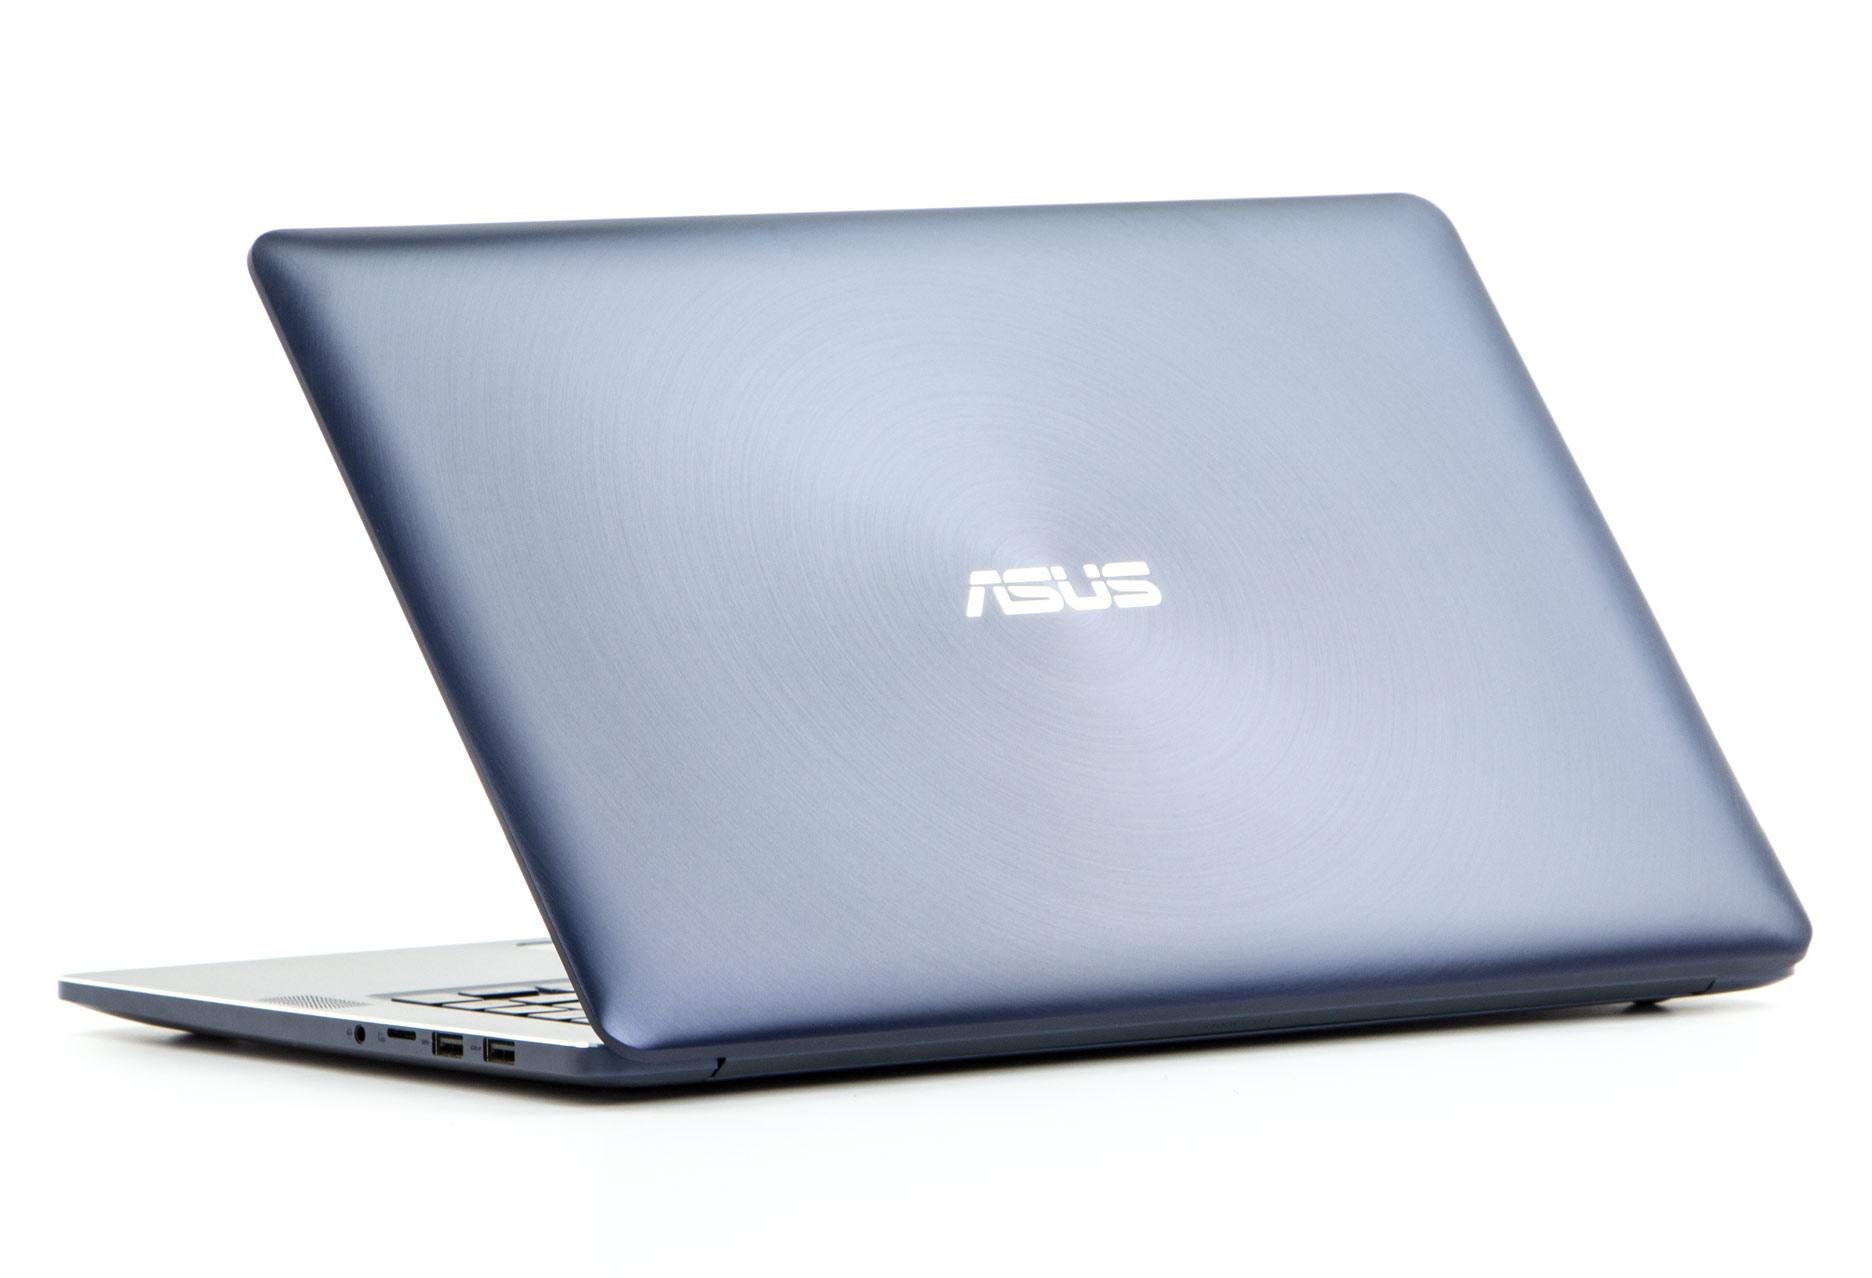 Asus ZenBook Pro UX550VD tył